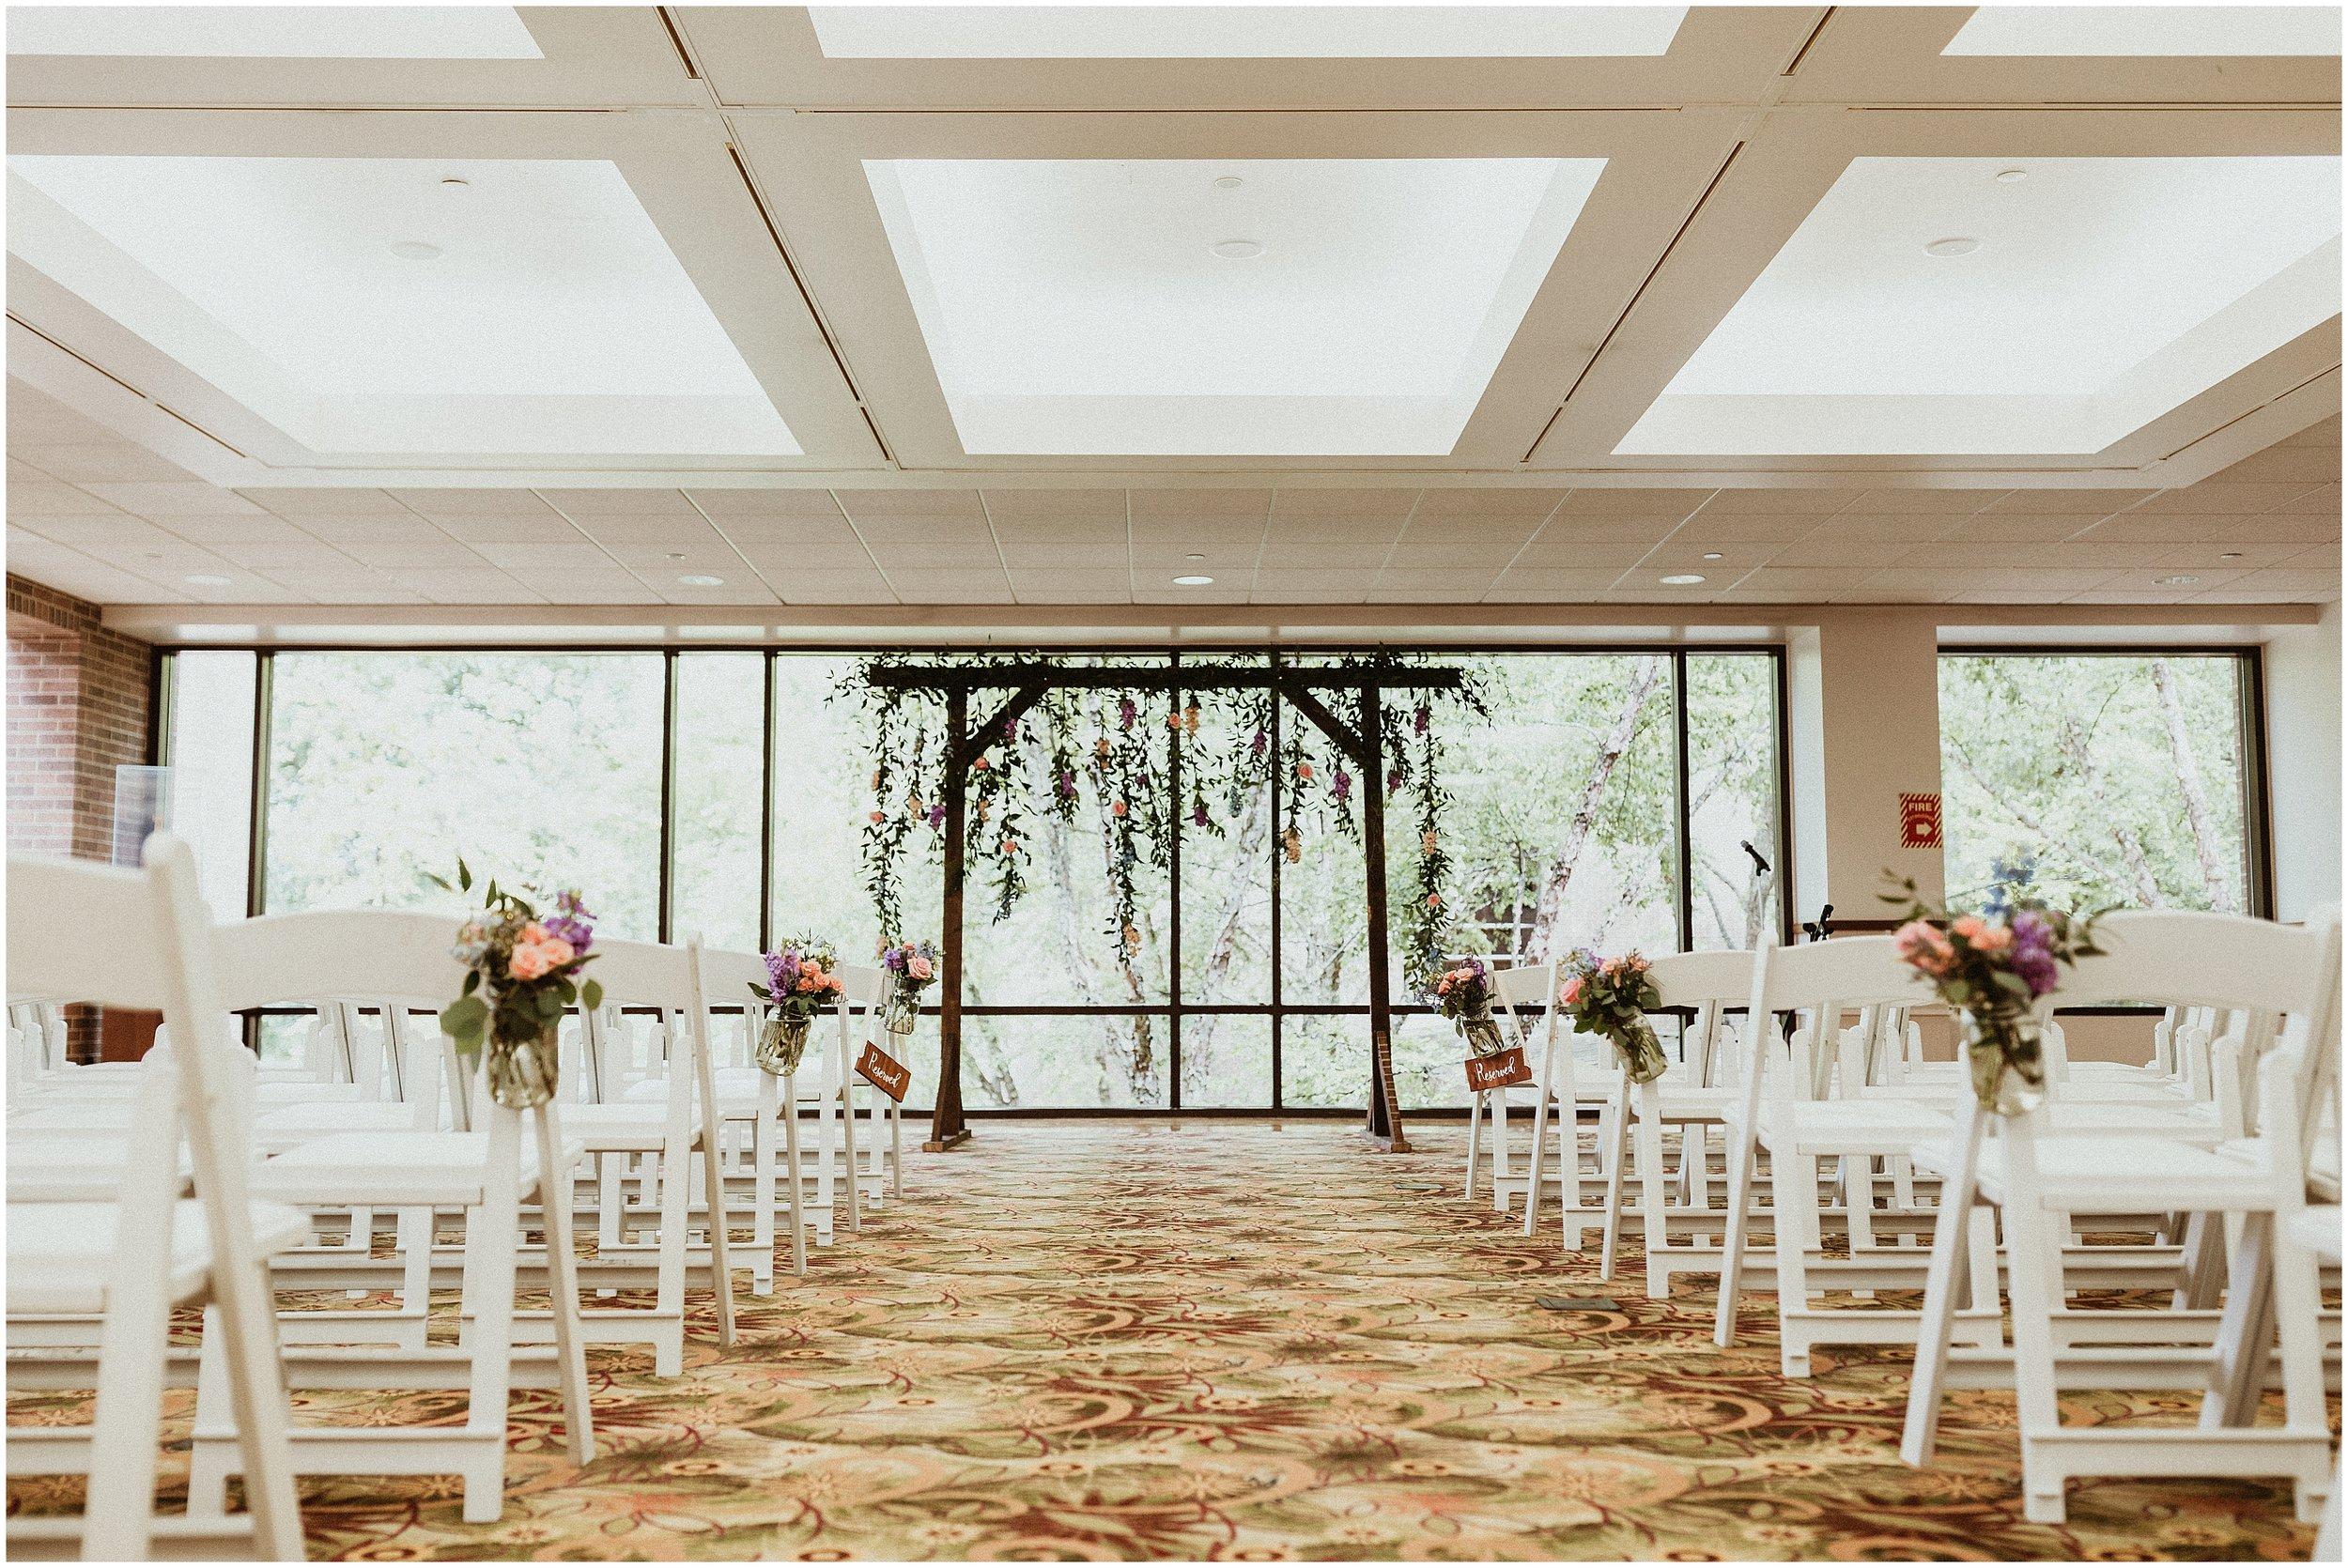 Rachel and Patrick | Rustic & Romantic Summer Wedding | Q Center St. Charles, IL